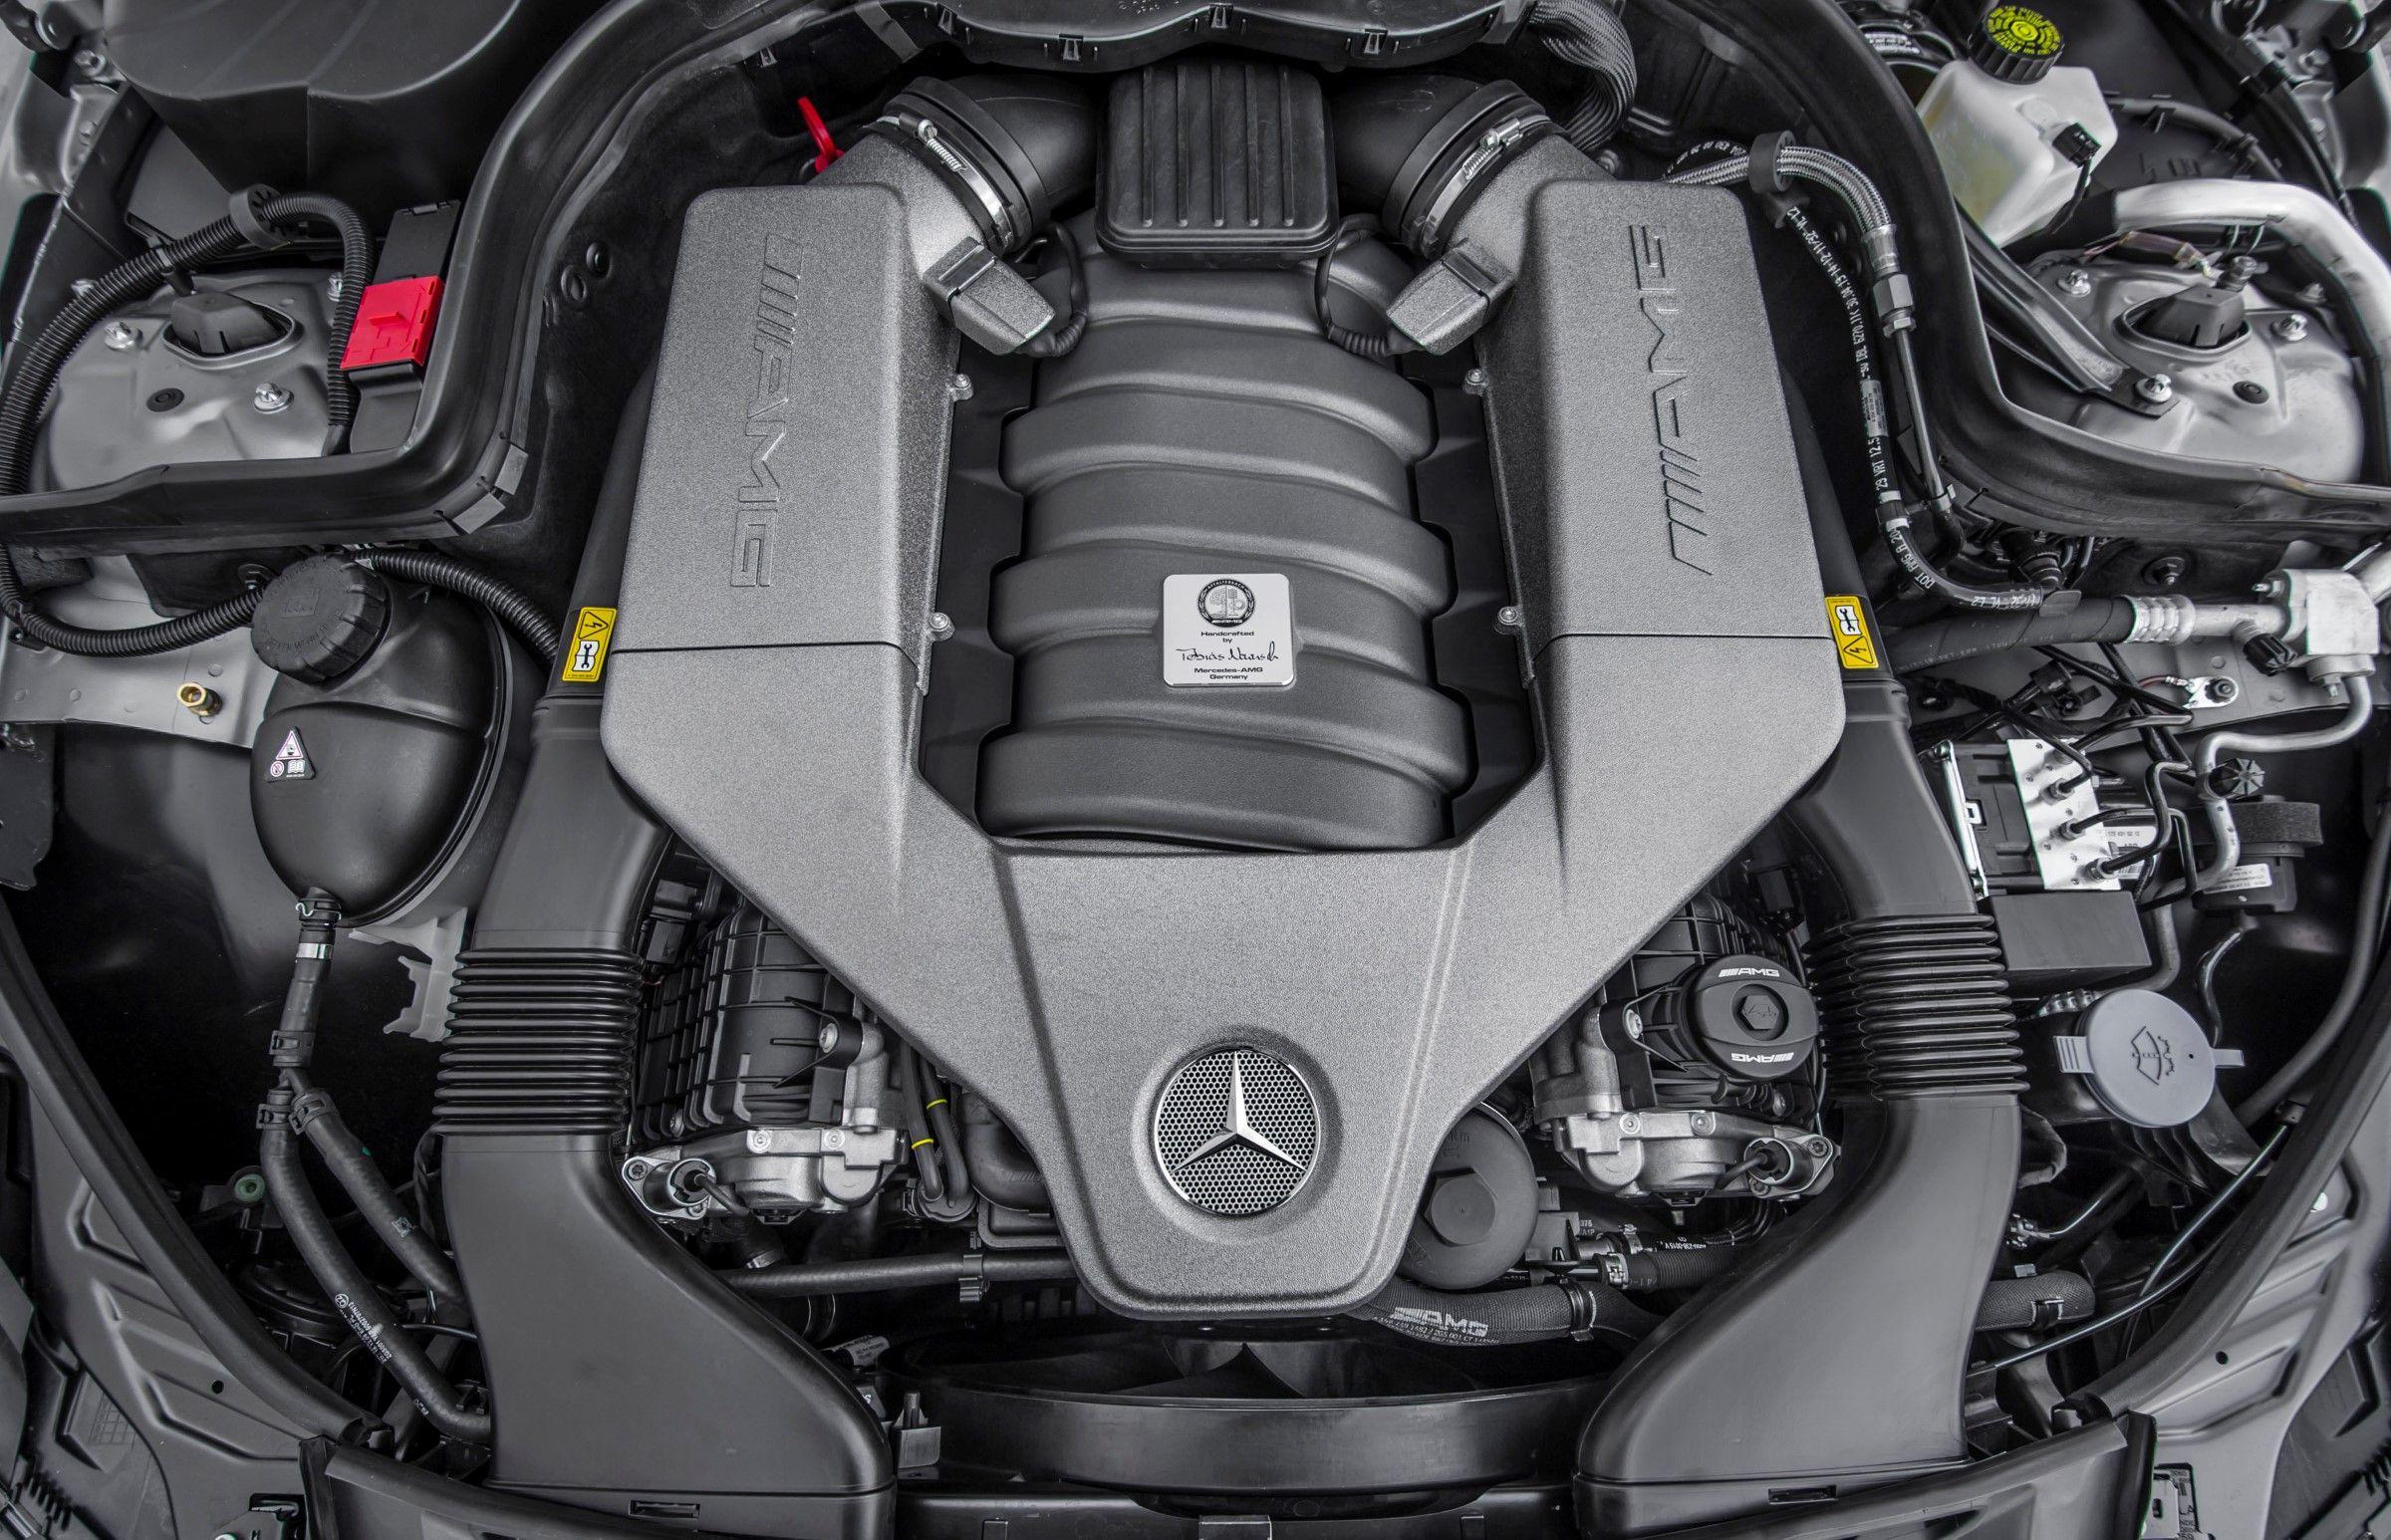 2014 Mercedes Benz C63 Amg Sedan Photo 540060 S 1280x782 Jpg 1280